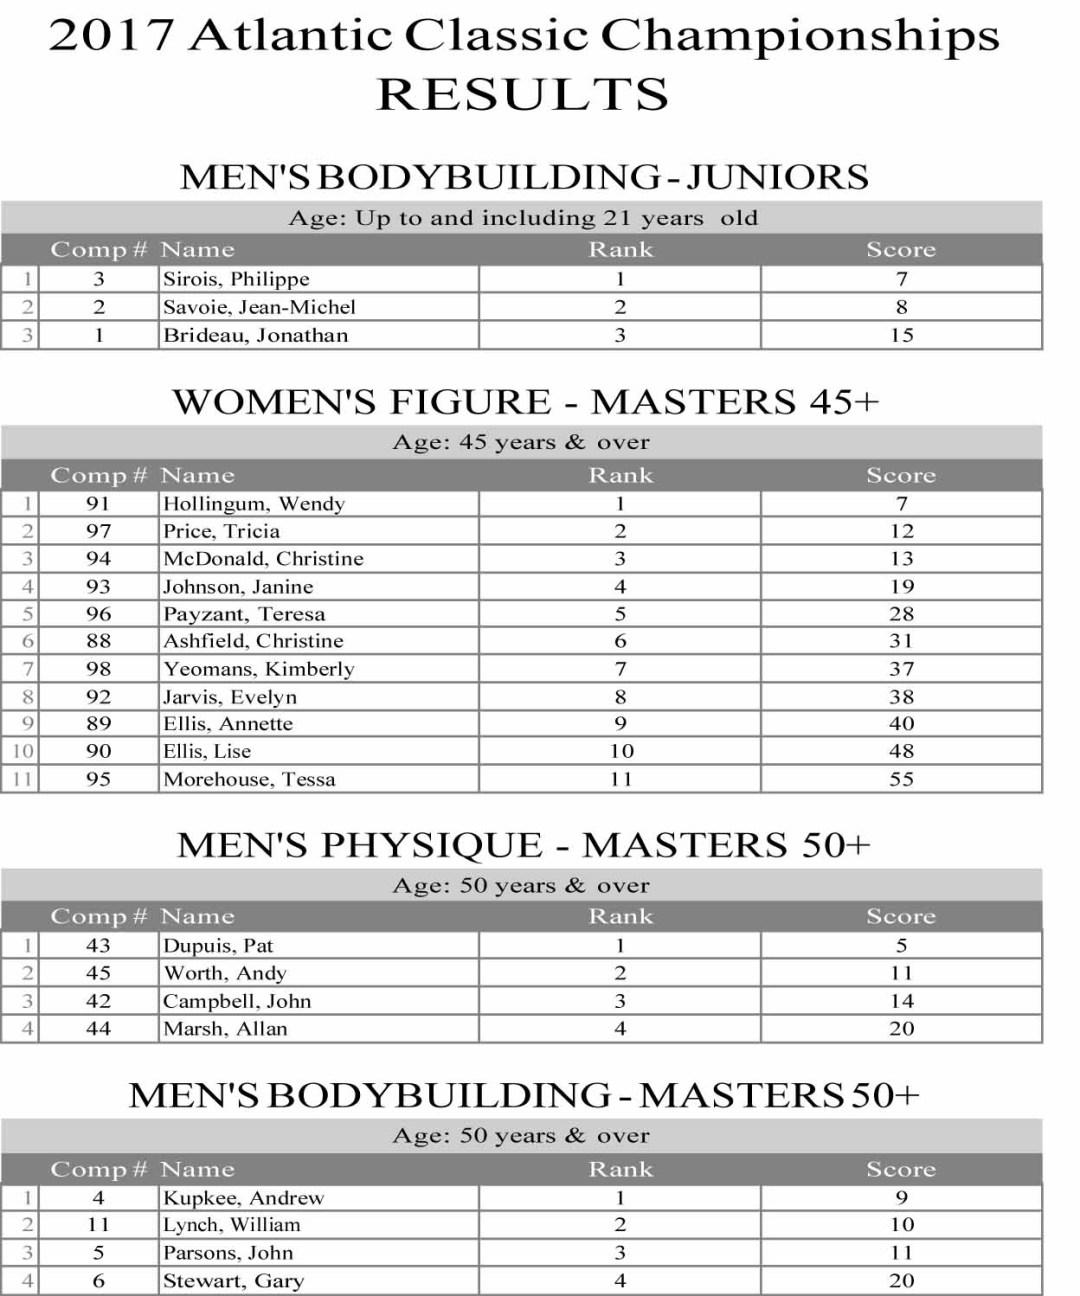 2017 Atlantic Classic Championships